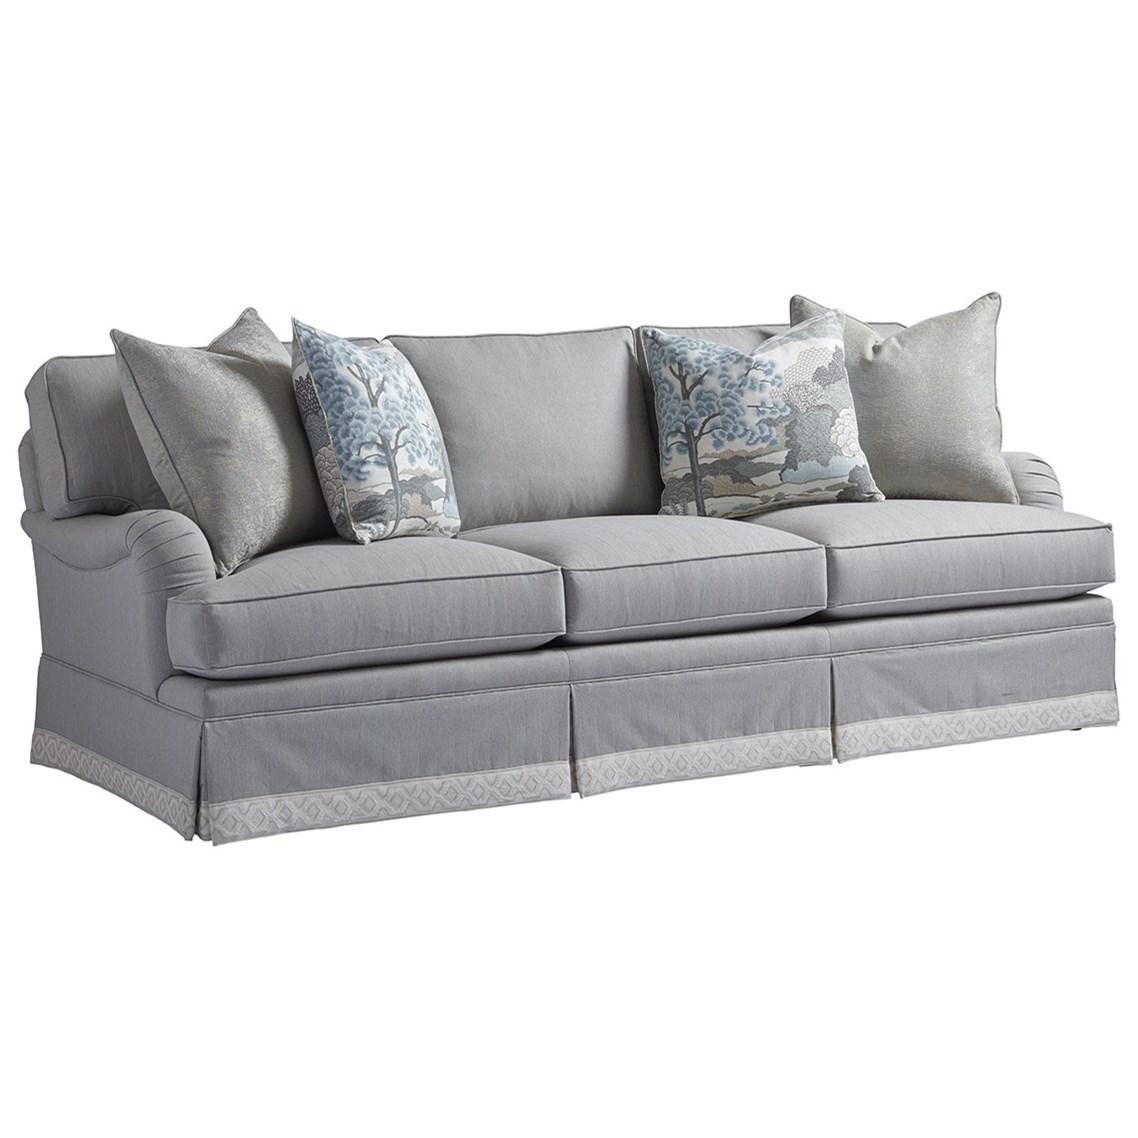 Barclay Butera Upholstery Blaire Sofa by Barclay Butera at Baer's Furniture